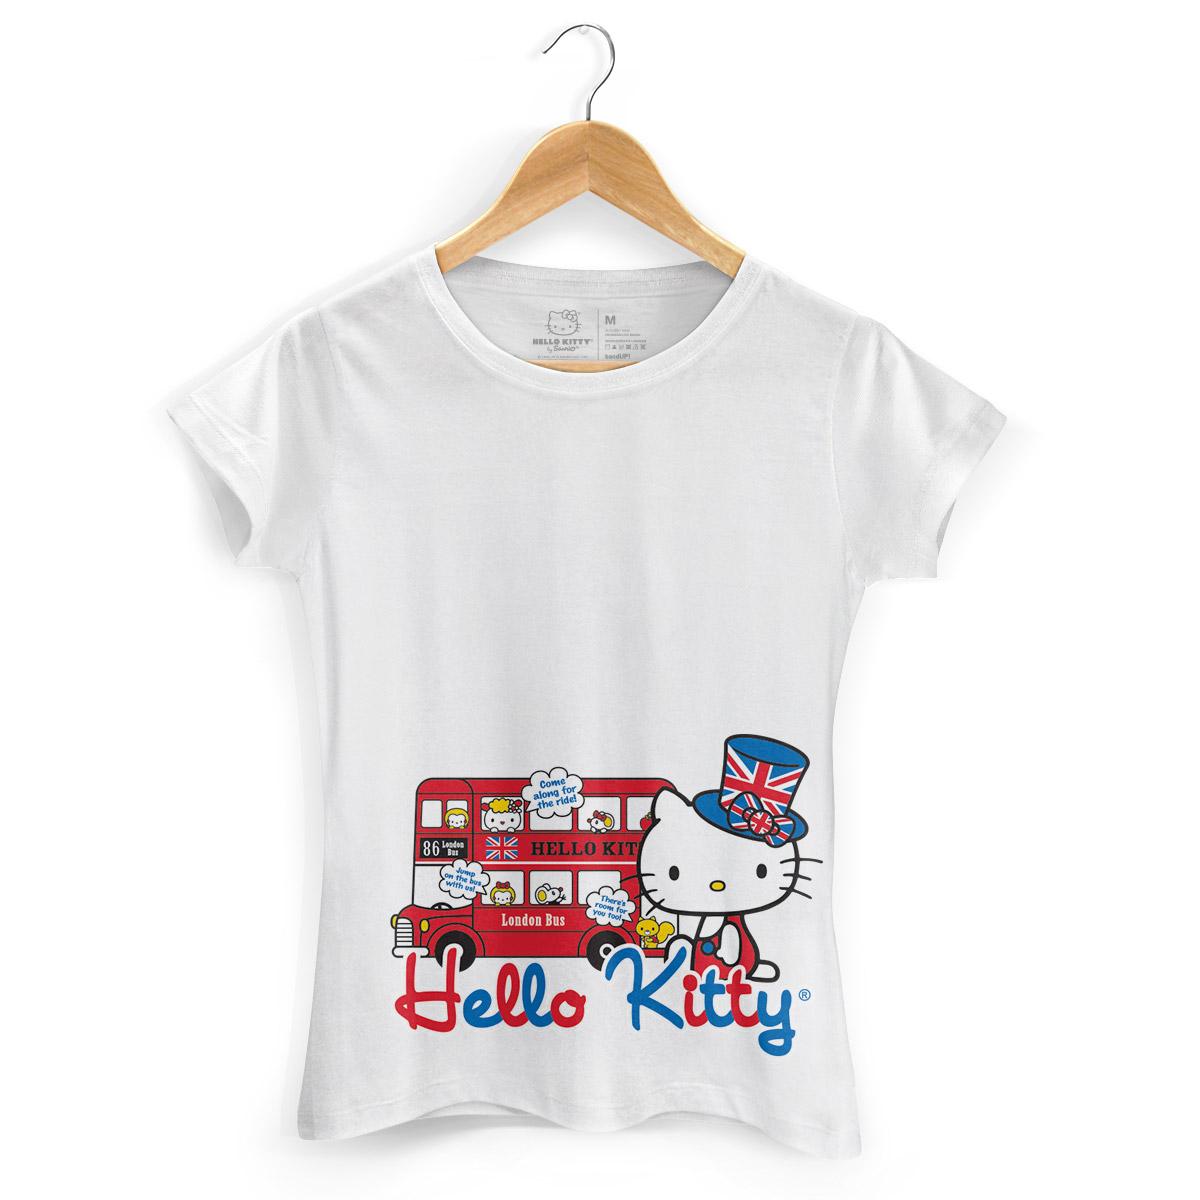 Camiseta Hello Kitty London Bus